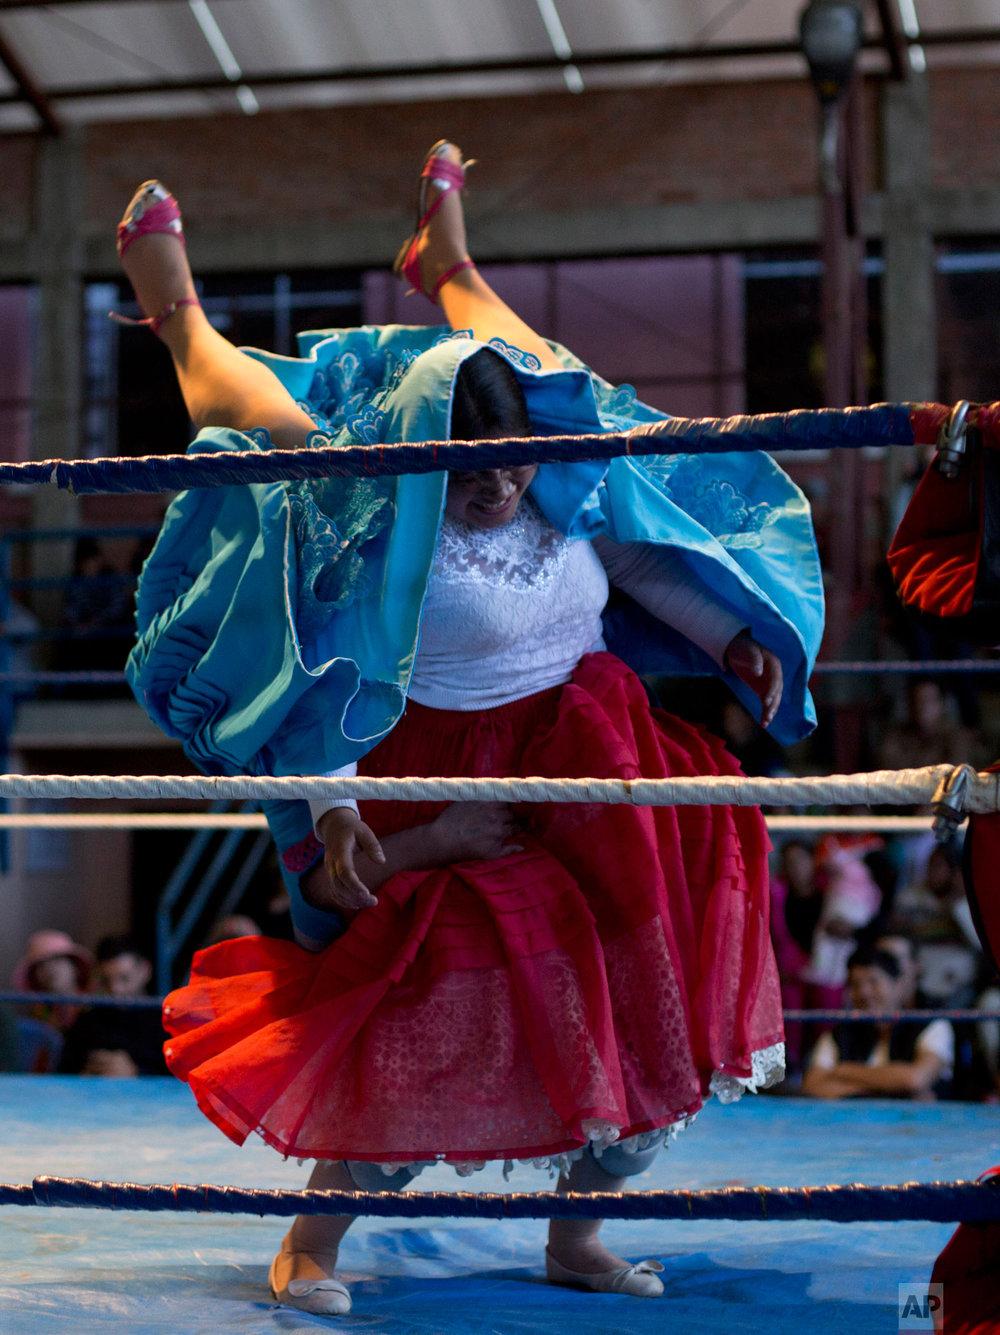 Veteran cholita wrestler Jennifer Dos Caras, 45, competes in the ring with Randy Four in El Alto, Bolivia, Jan. 21, 2019.